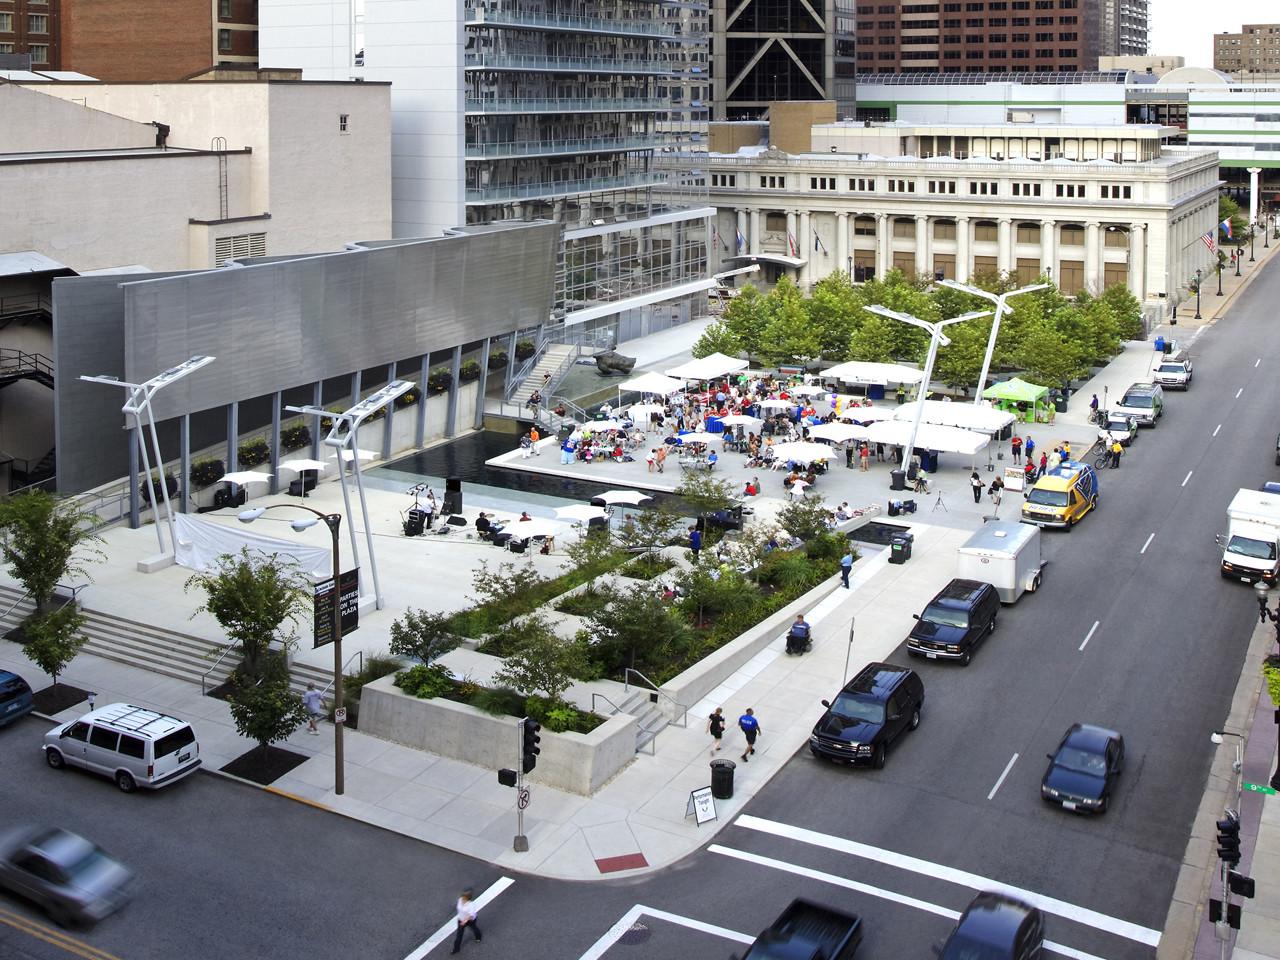 City Center Mall St Louis